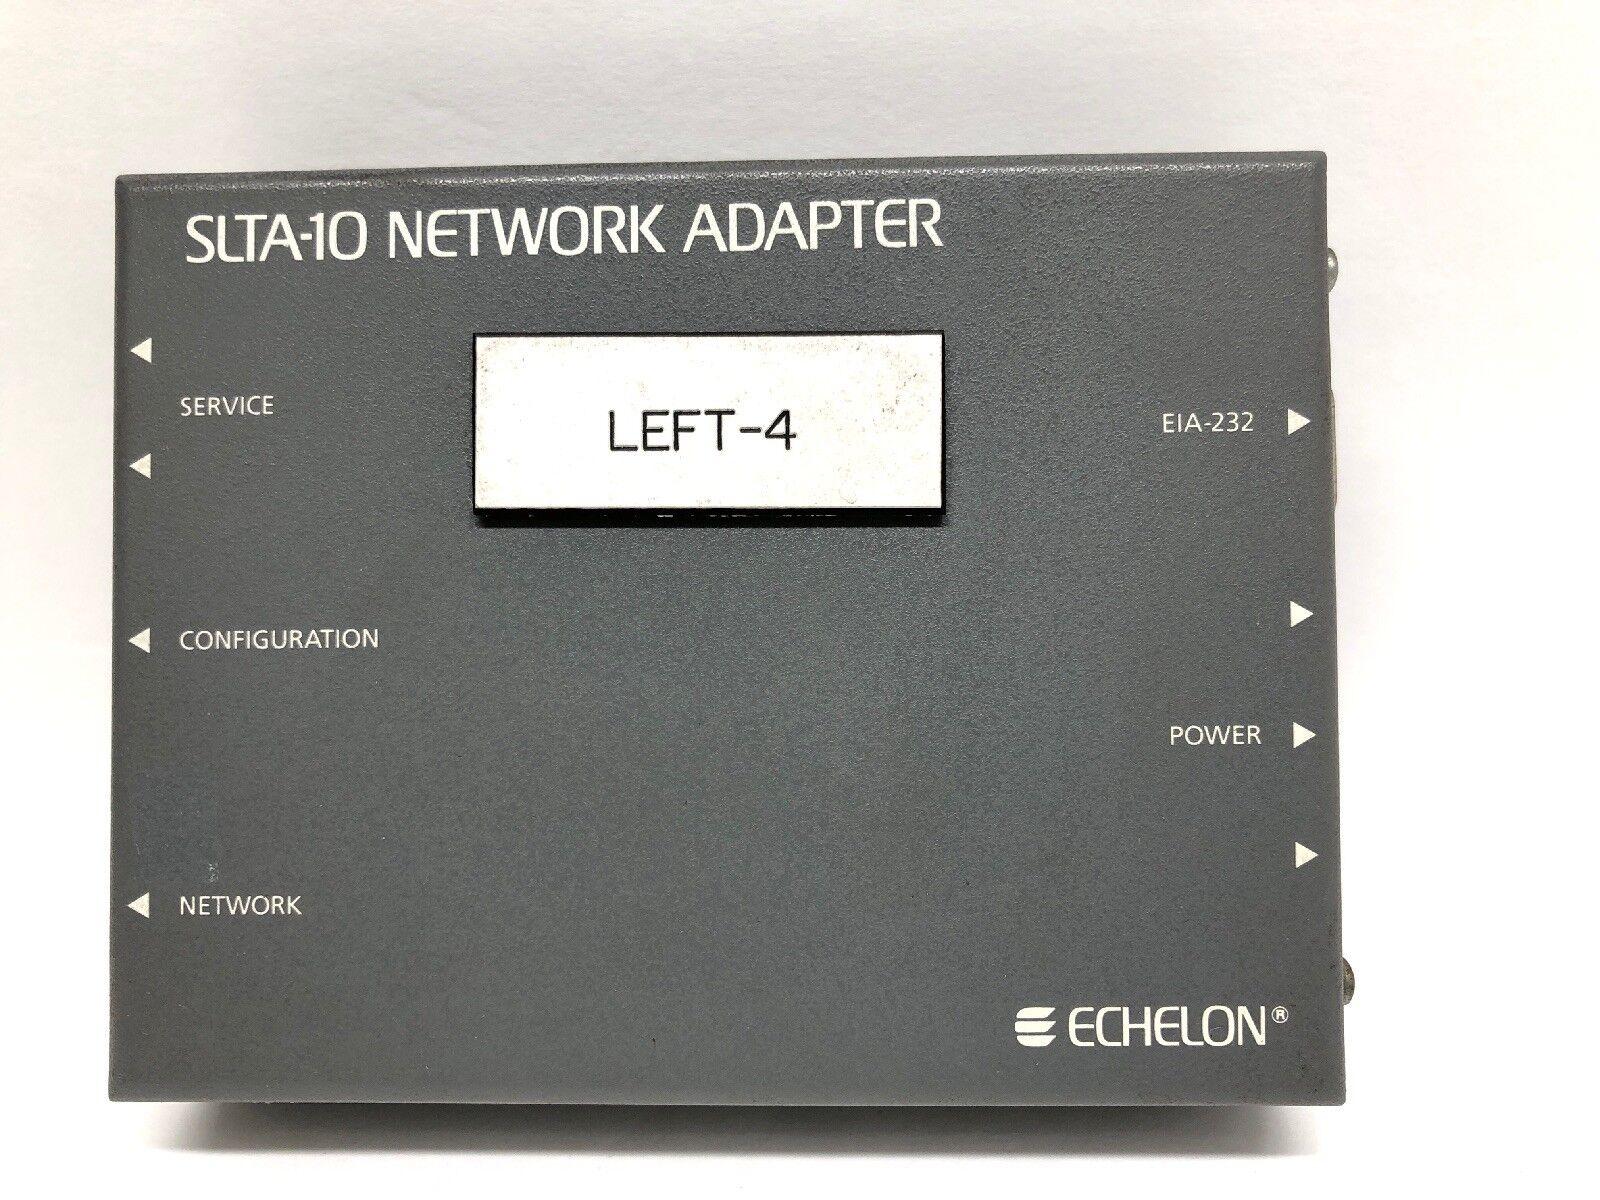 ECHELON PCC-10 NETWORK ADAPTER DRIVERS FOR WINDOWS MAC